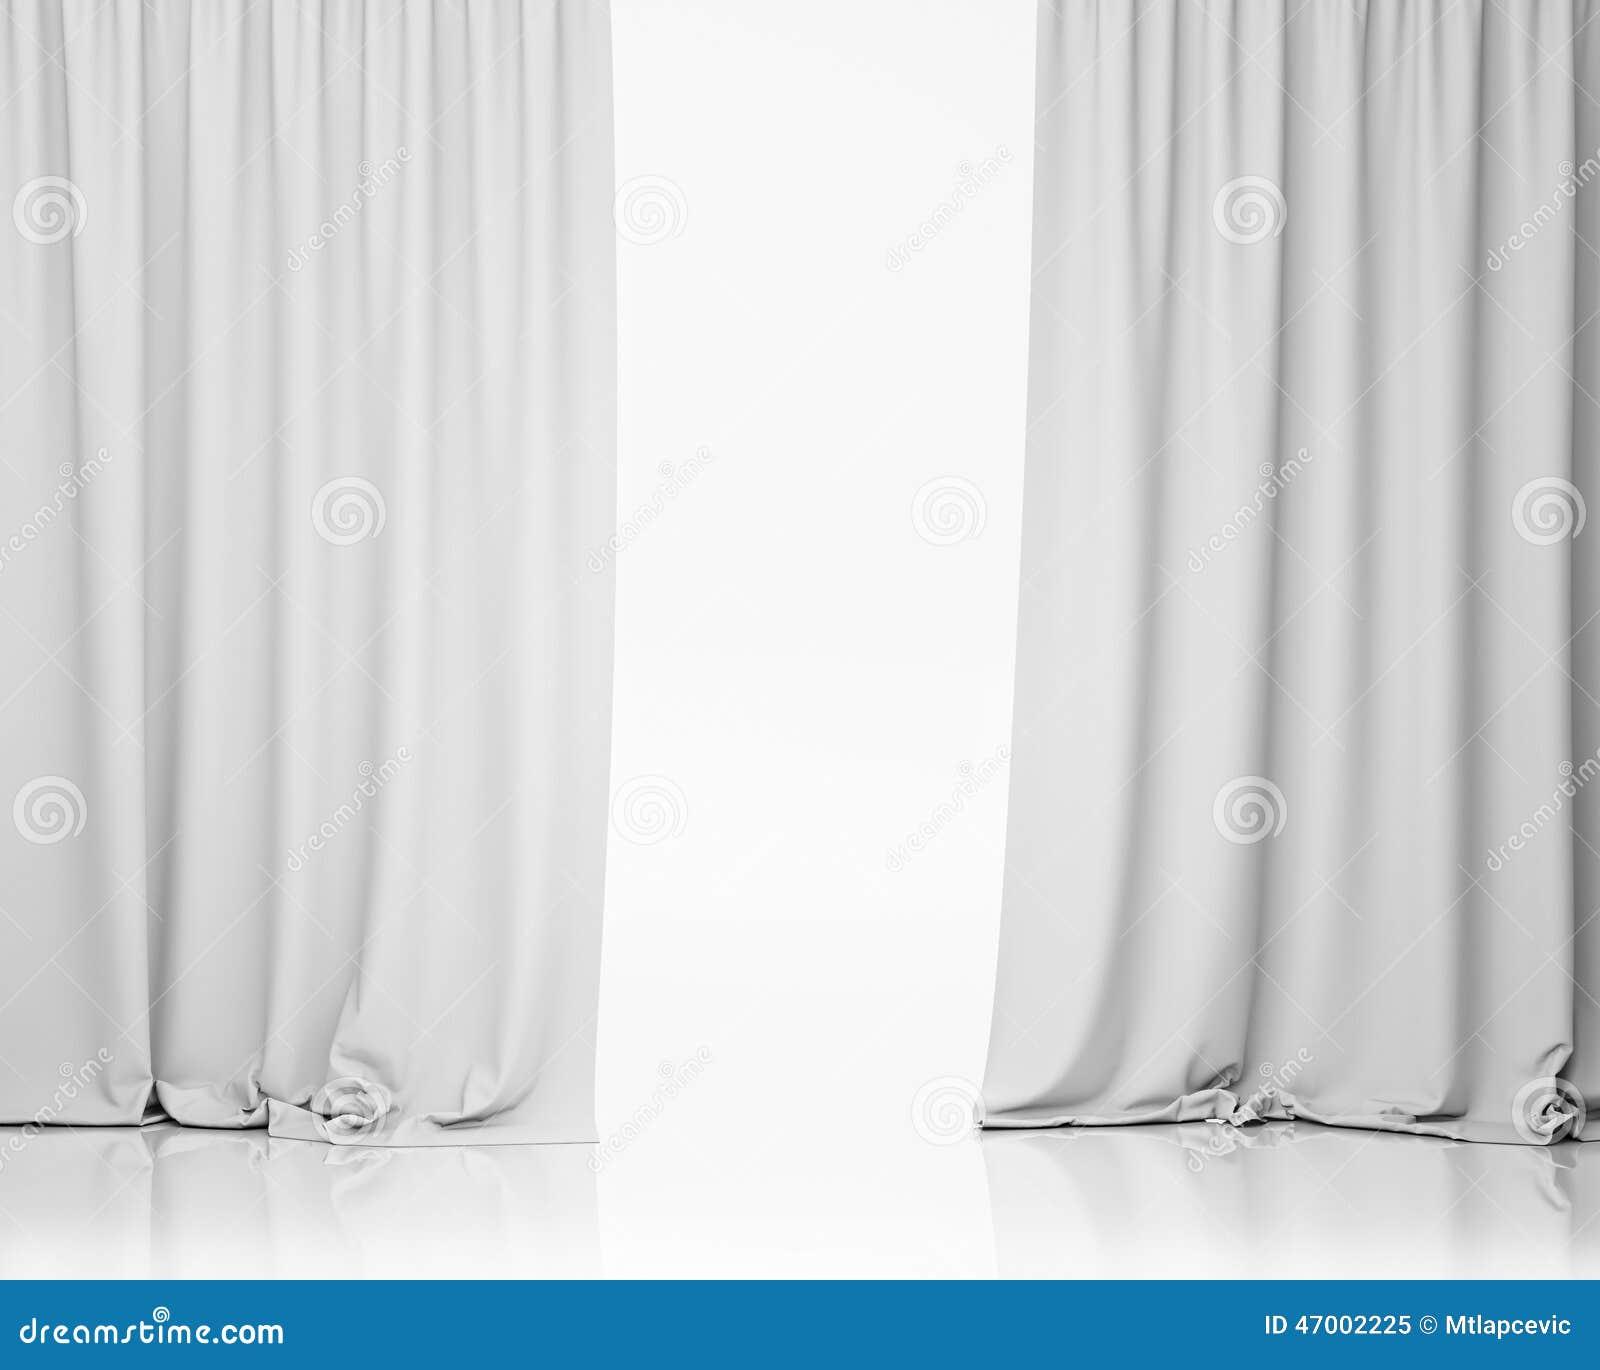 White stage curtain background stock illustration image 47002225